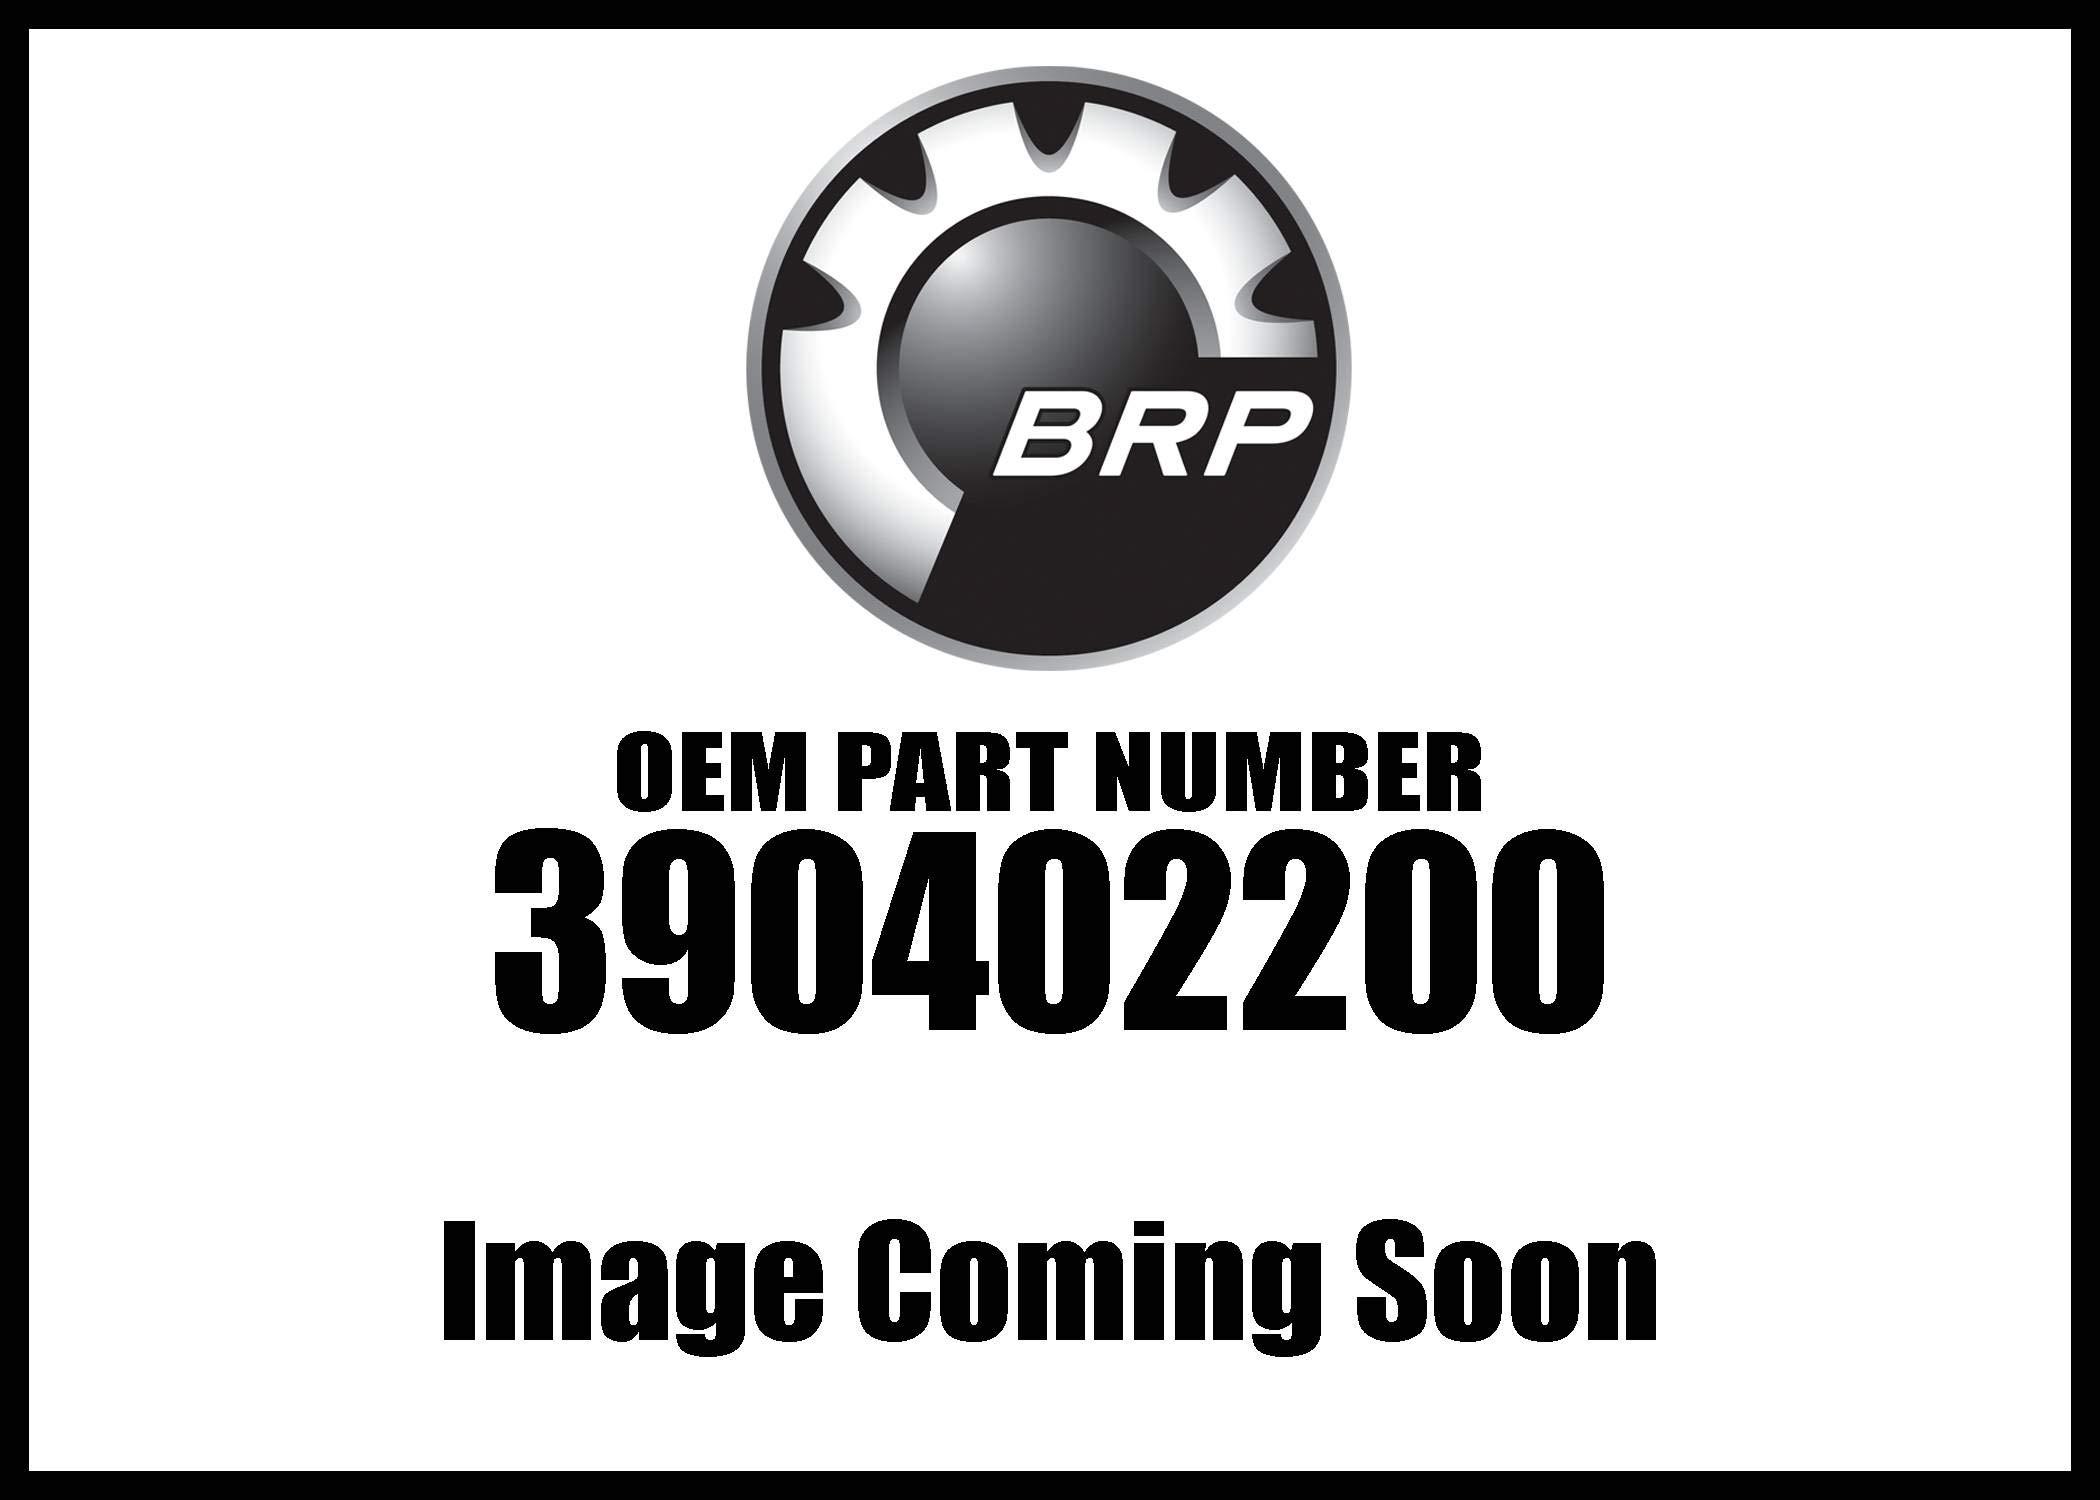 Can-Am 2001-2018 Commander 1000 Maverick X3 Turbo R Pop Rivet 3/16'' 390402200 New Oem